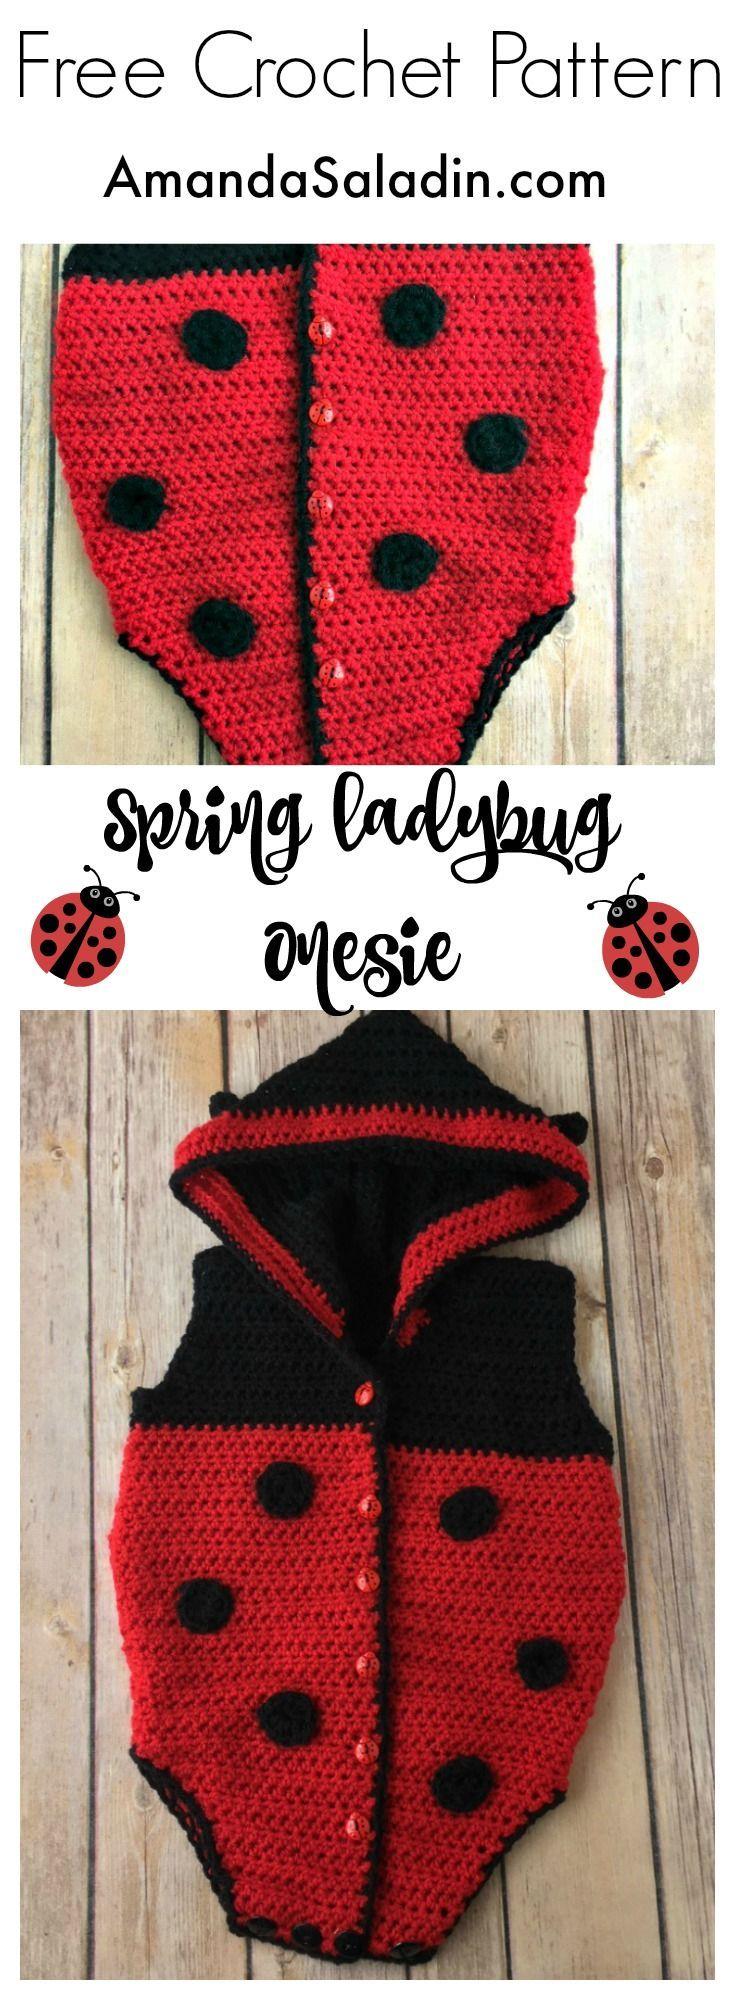 17 Best ideas about Knit Baby Dress 2017 on Pinterest ...